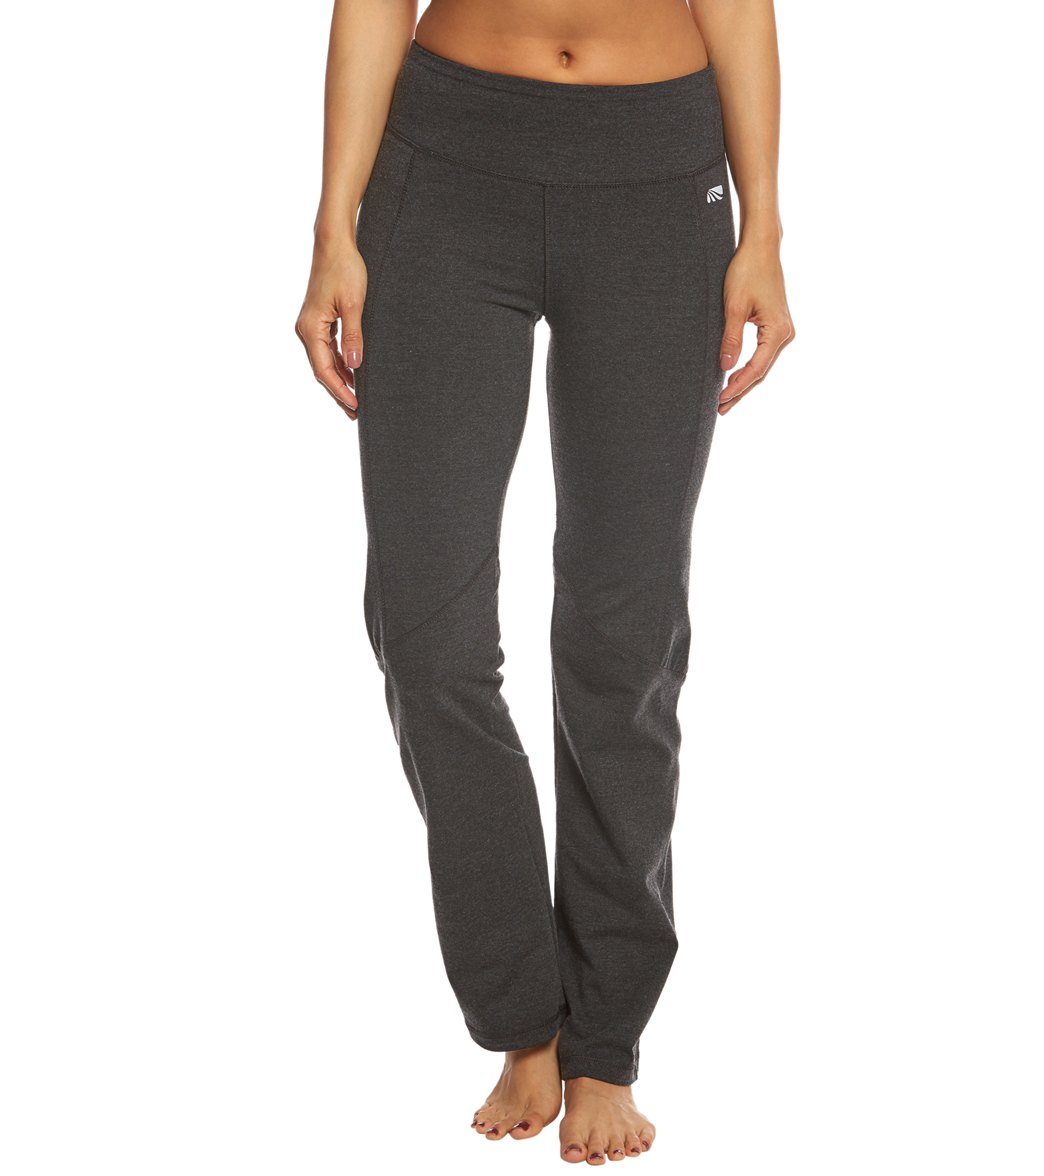 ce59de9e619bd Marika Ultimate Slimming Cotton Yoga Pants at YogaOutlet.com - Free ...